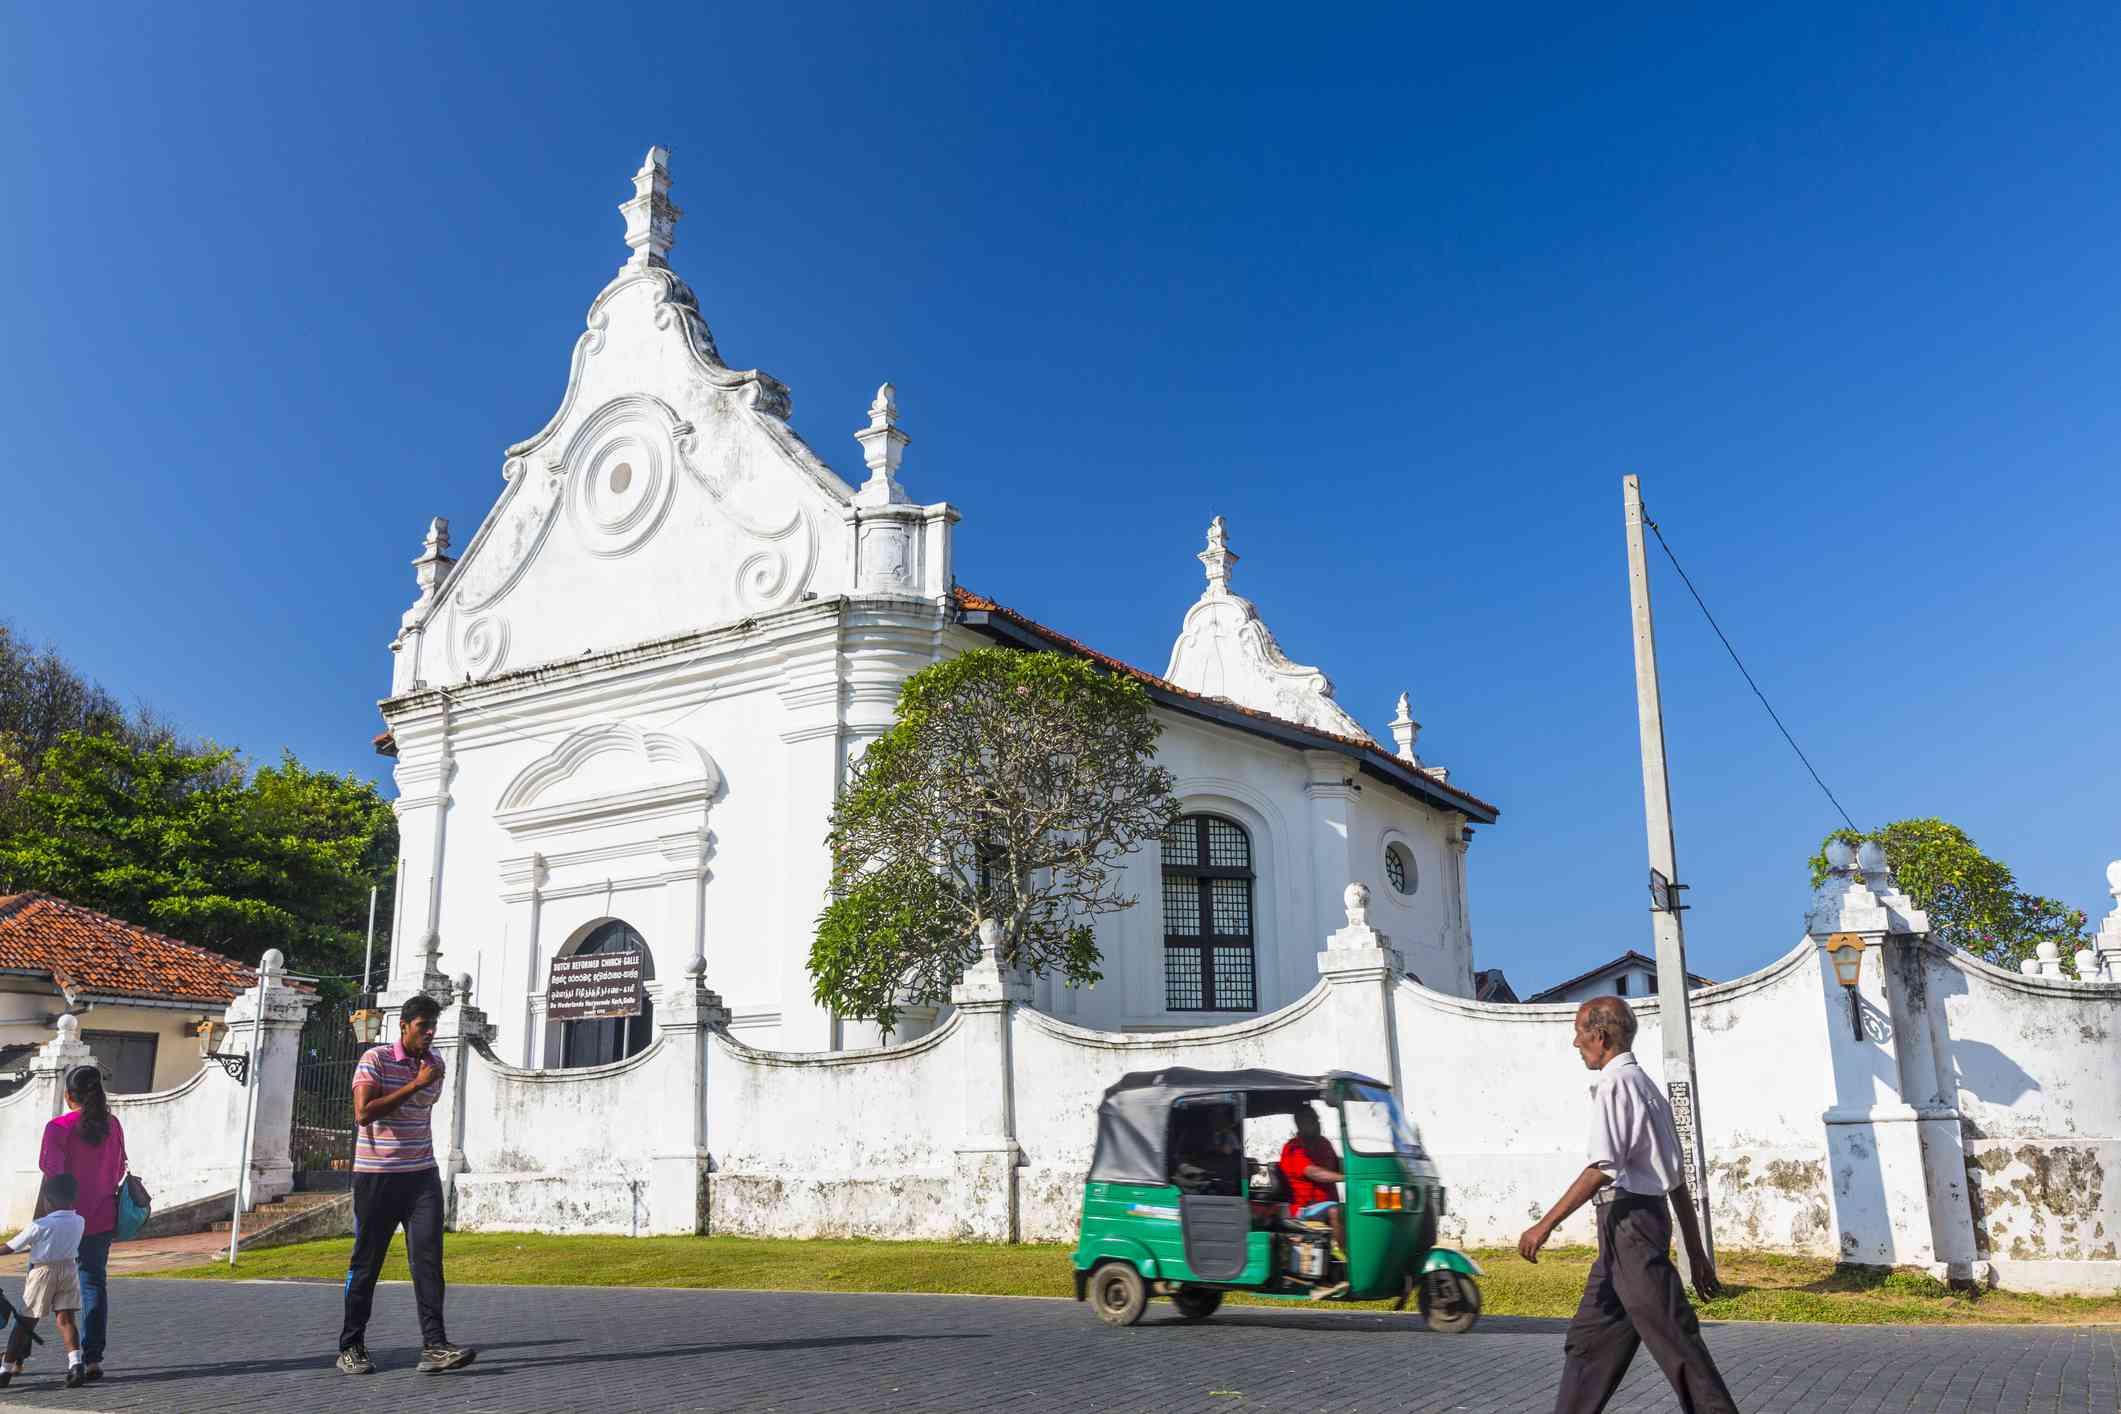 The 1752 Dutch Reformed Church in Galle, Sri Lanka